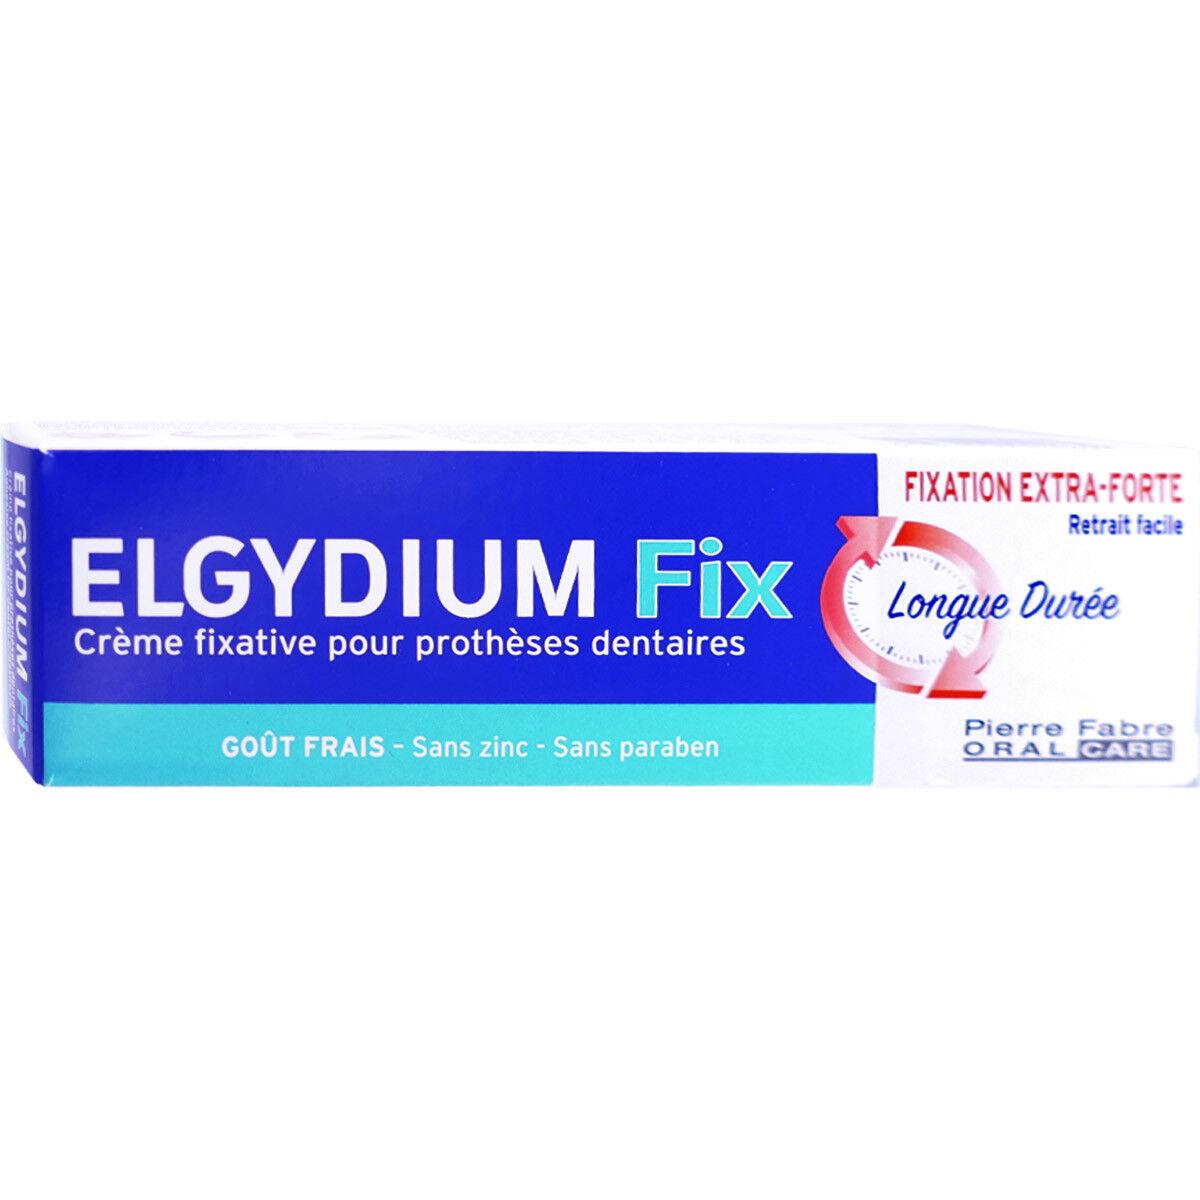 Elgydium fix creme fixatrice extra forte gout frais 45g